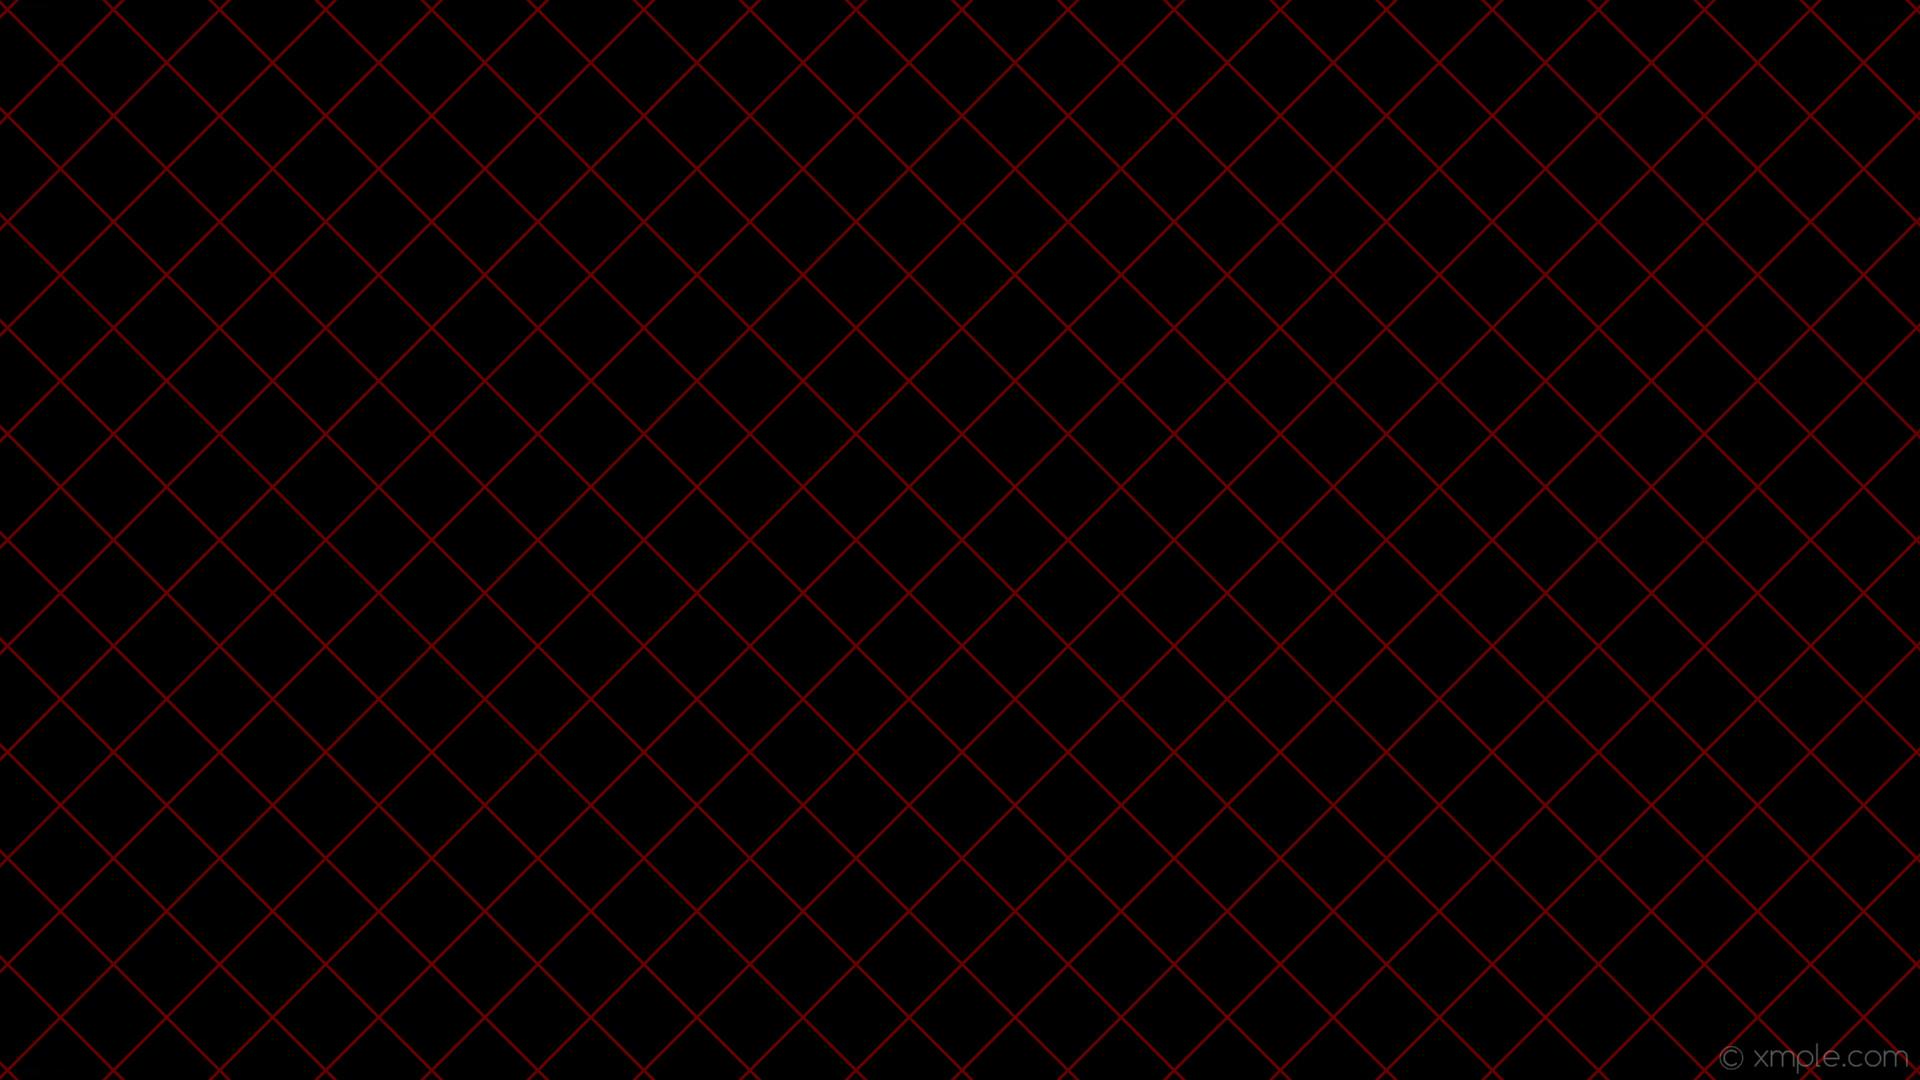 wallpaper black red graph paper grid dark red #000000 #8b0000 45° 3px 75px